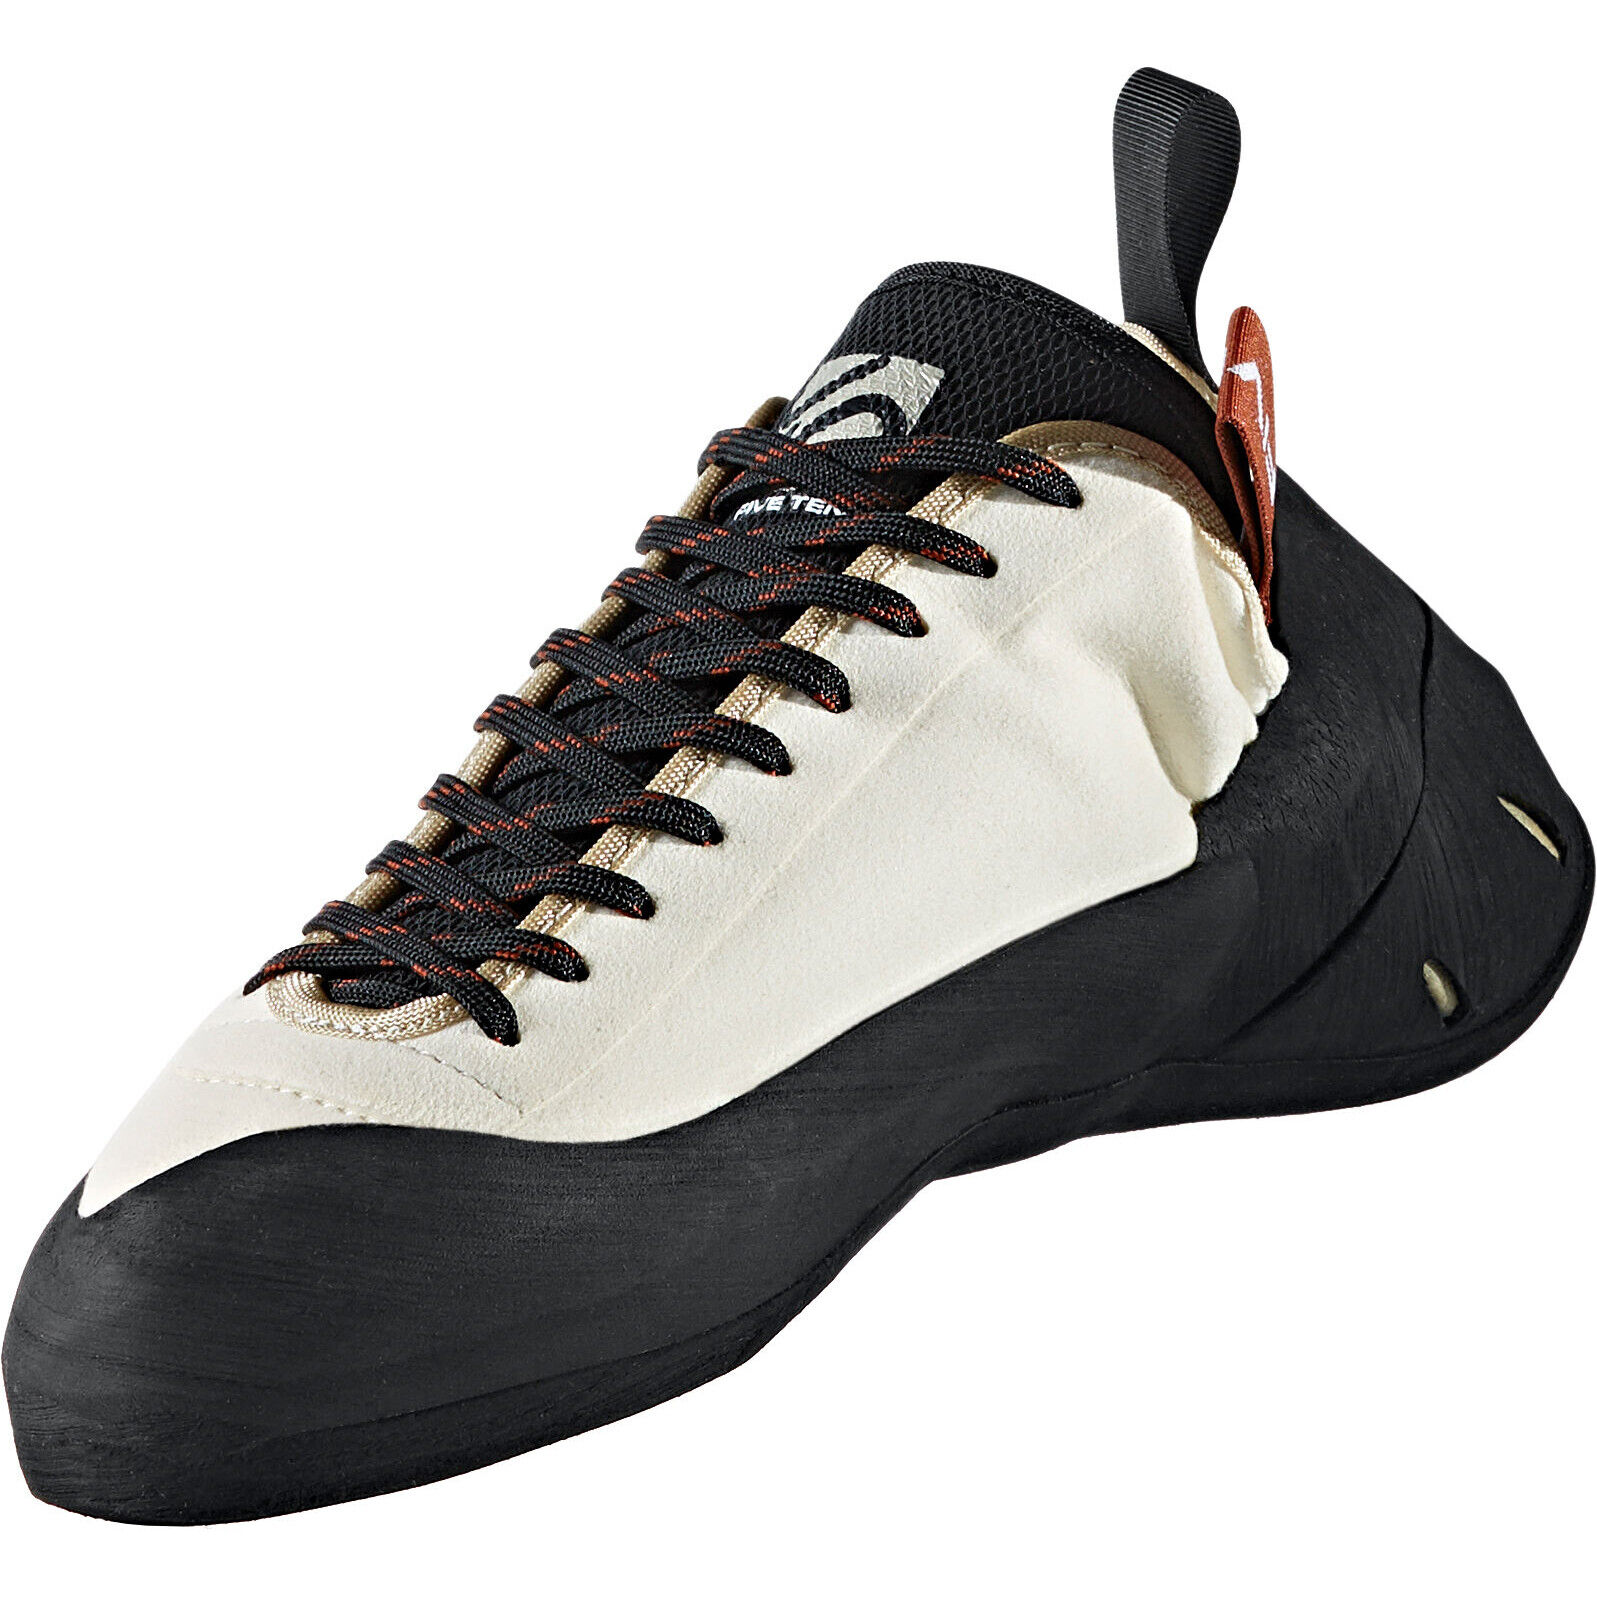 adidas Five Ten Quantum VCS Climbing Shoes solar yellow